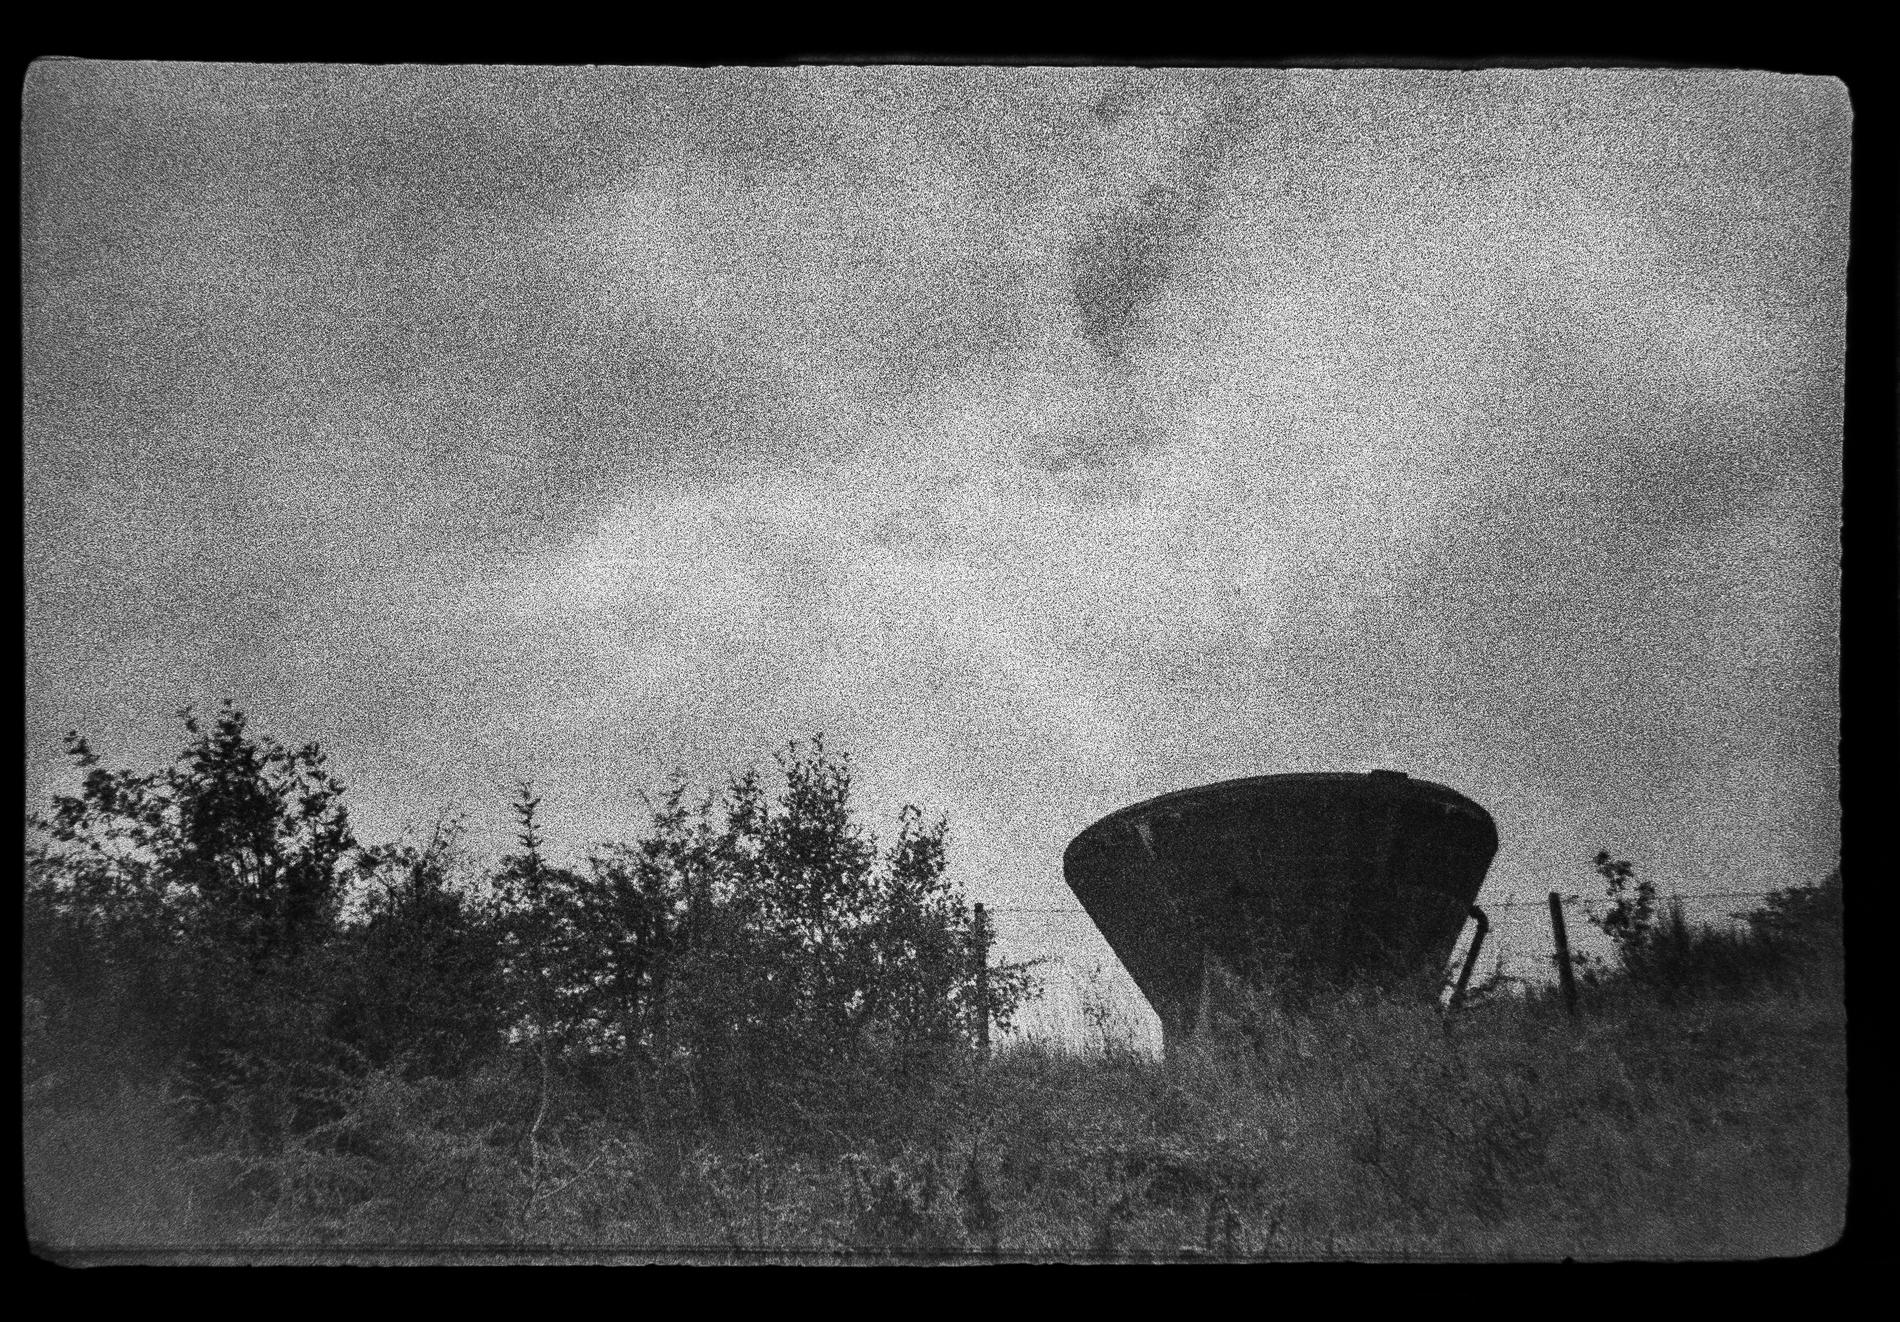 Grainy image of siding (Pic: Toby Van de Velde)